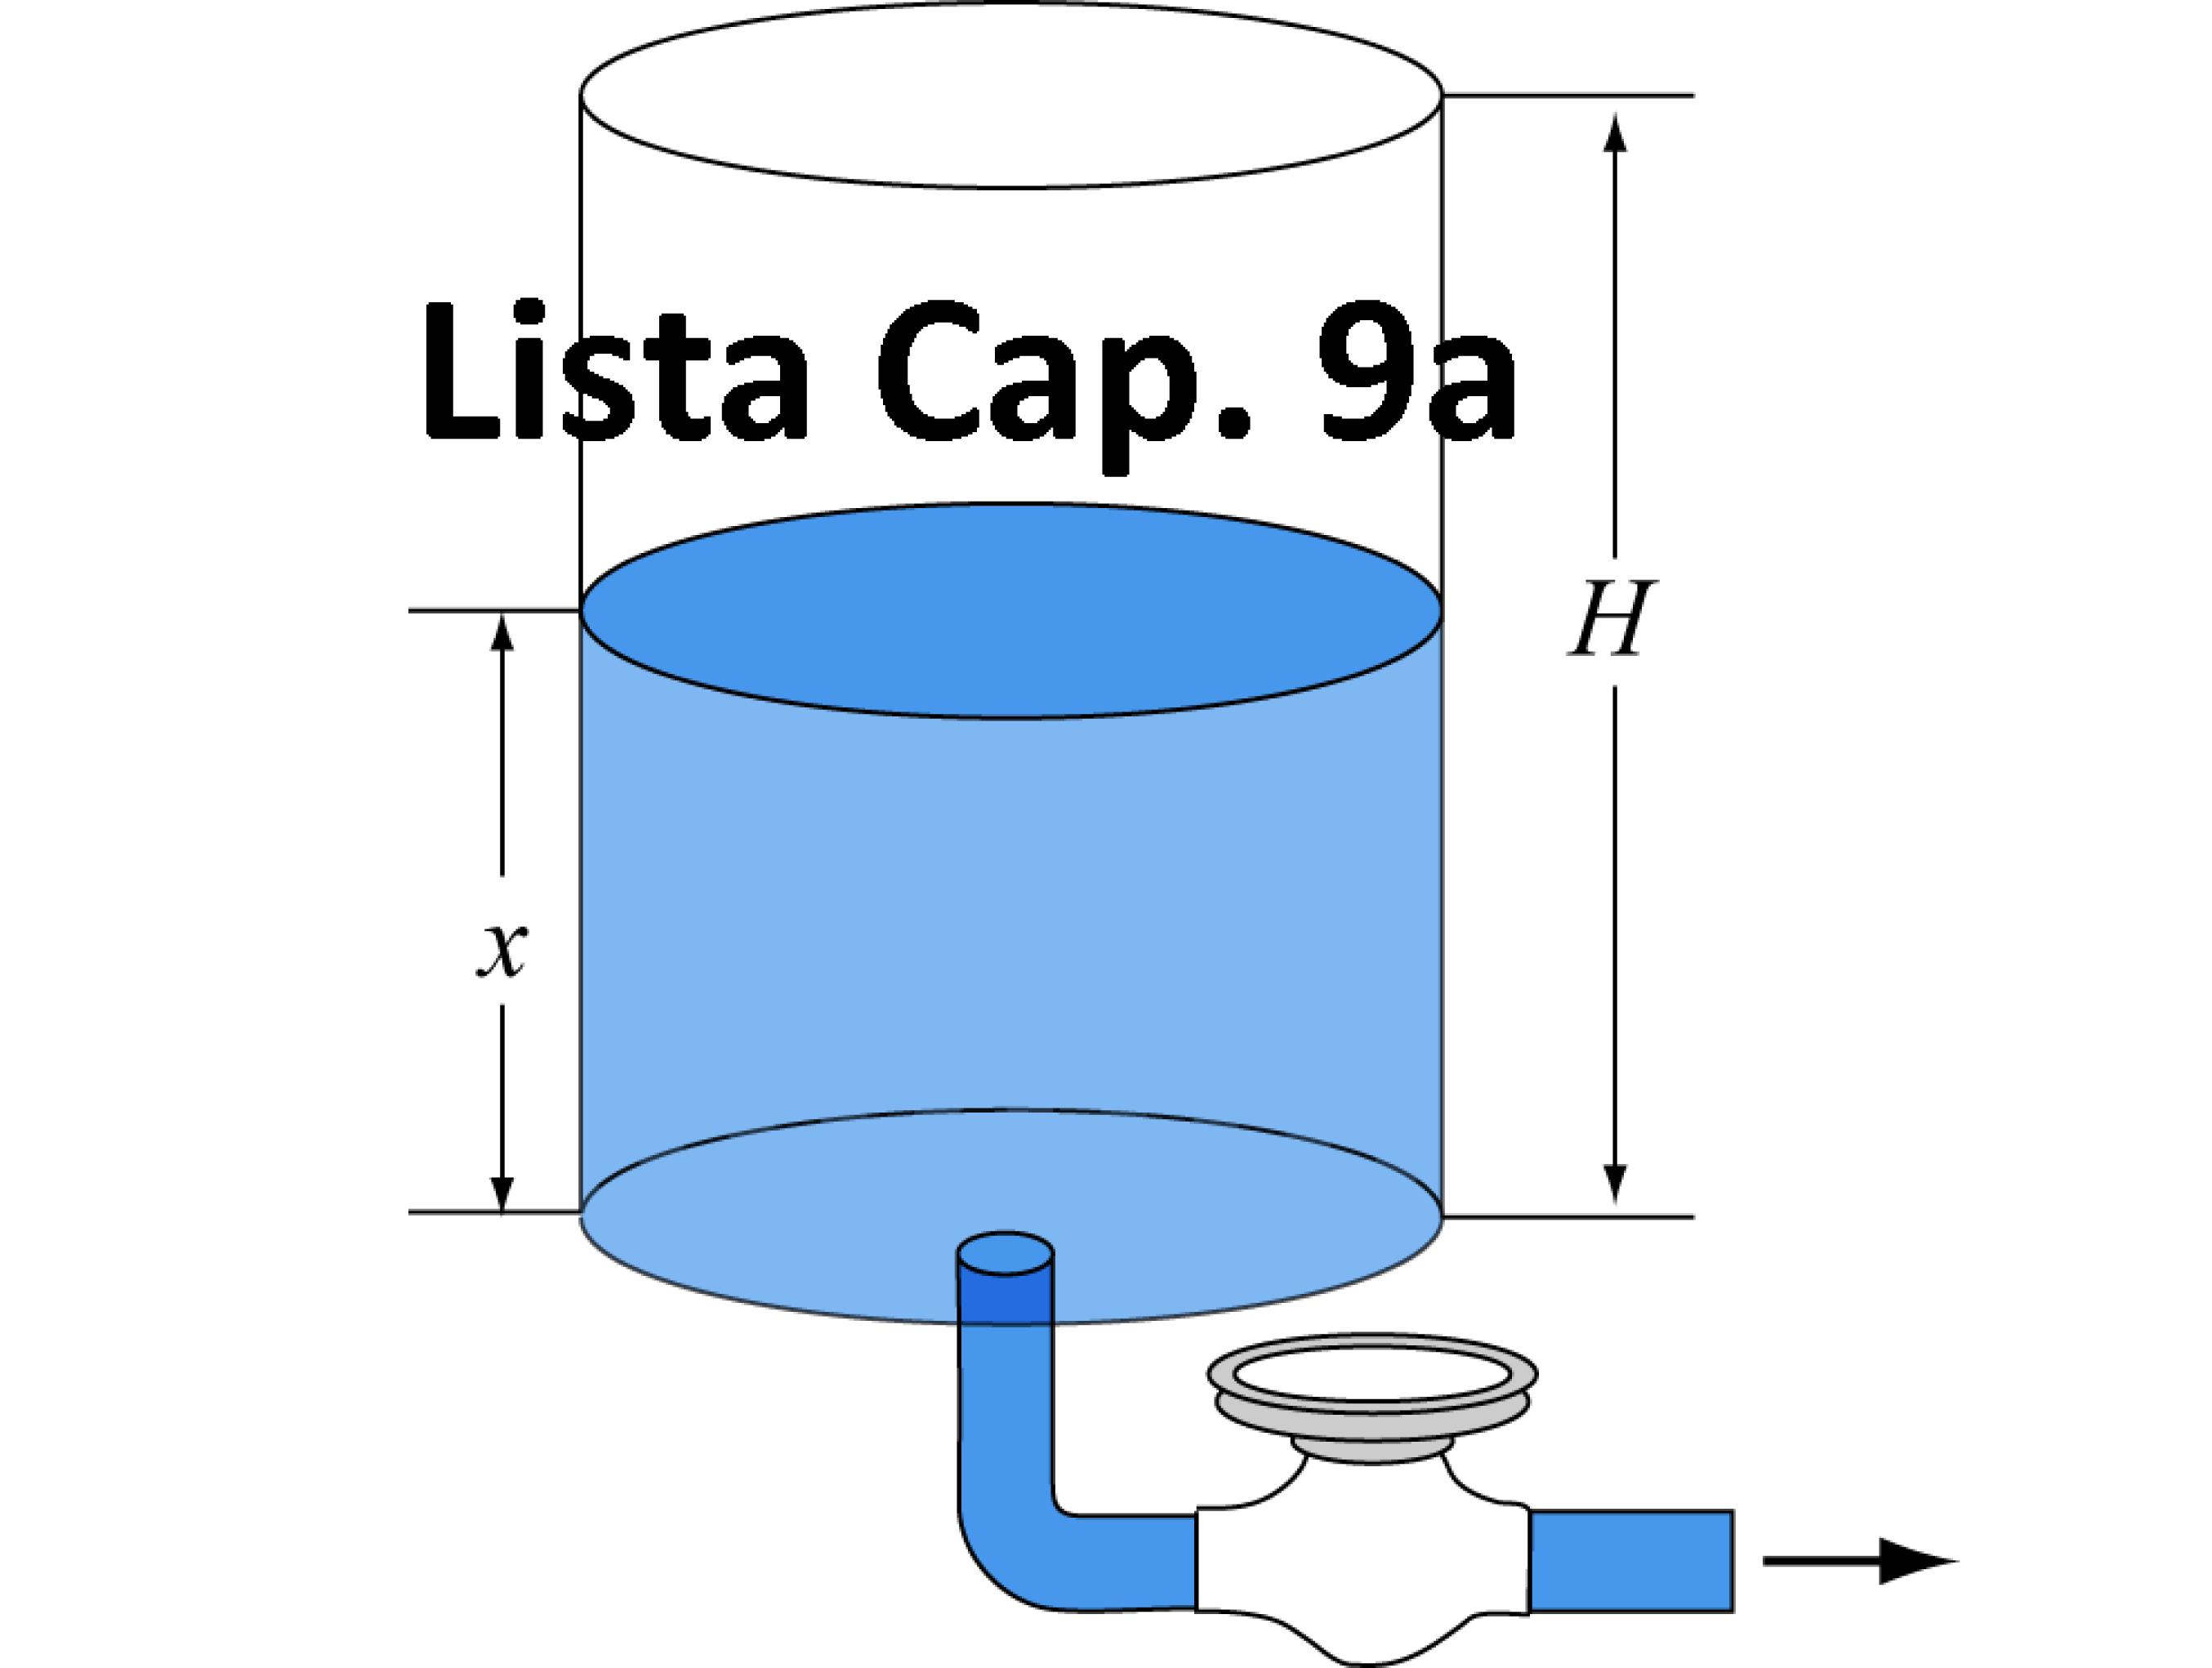 lista_cap9a